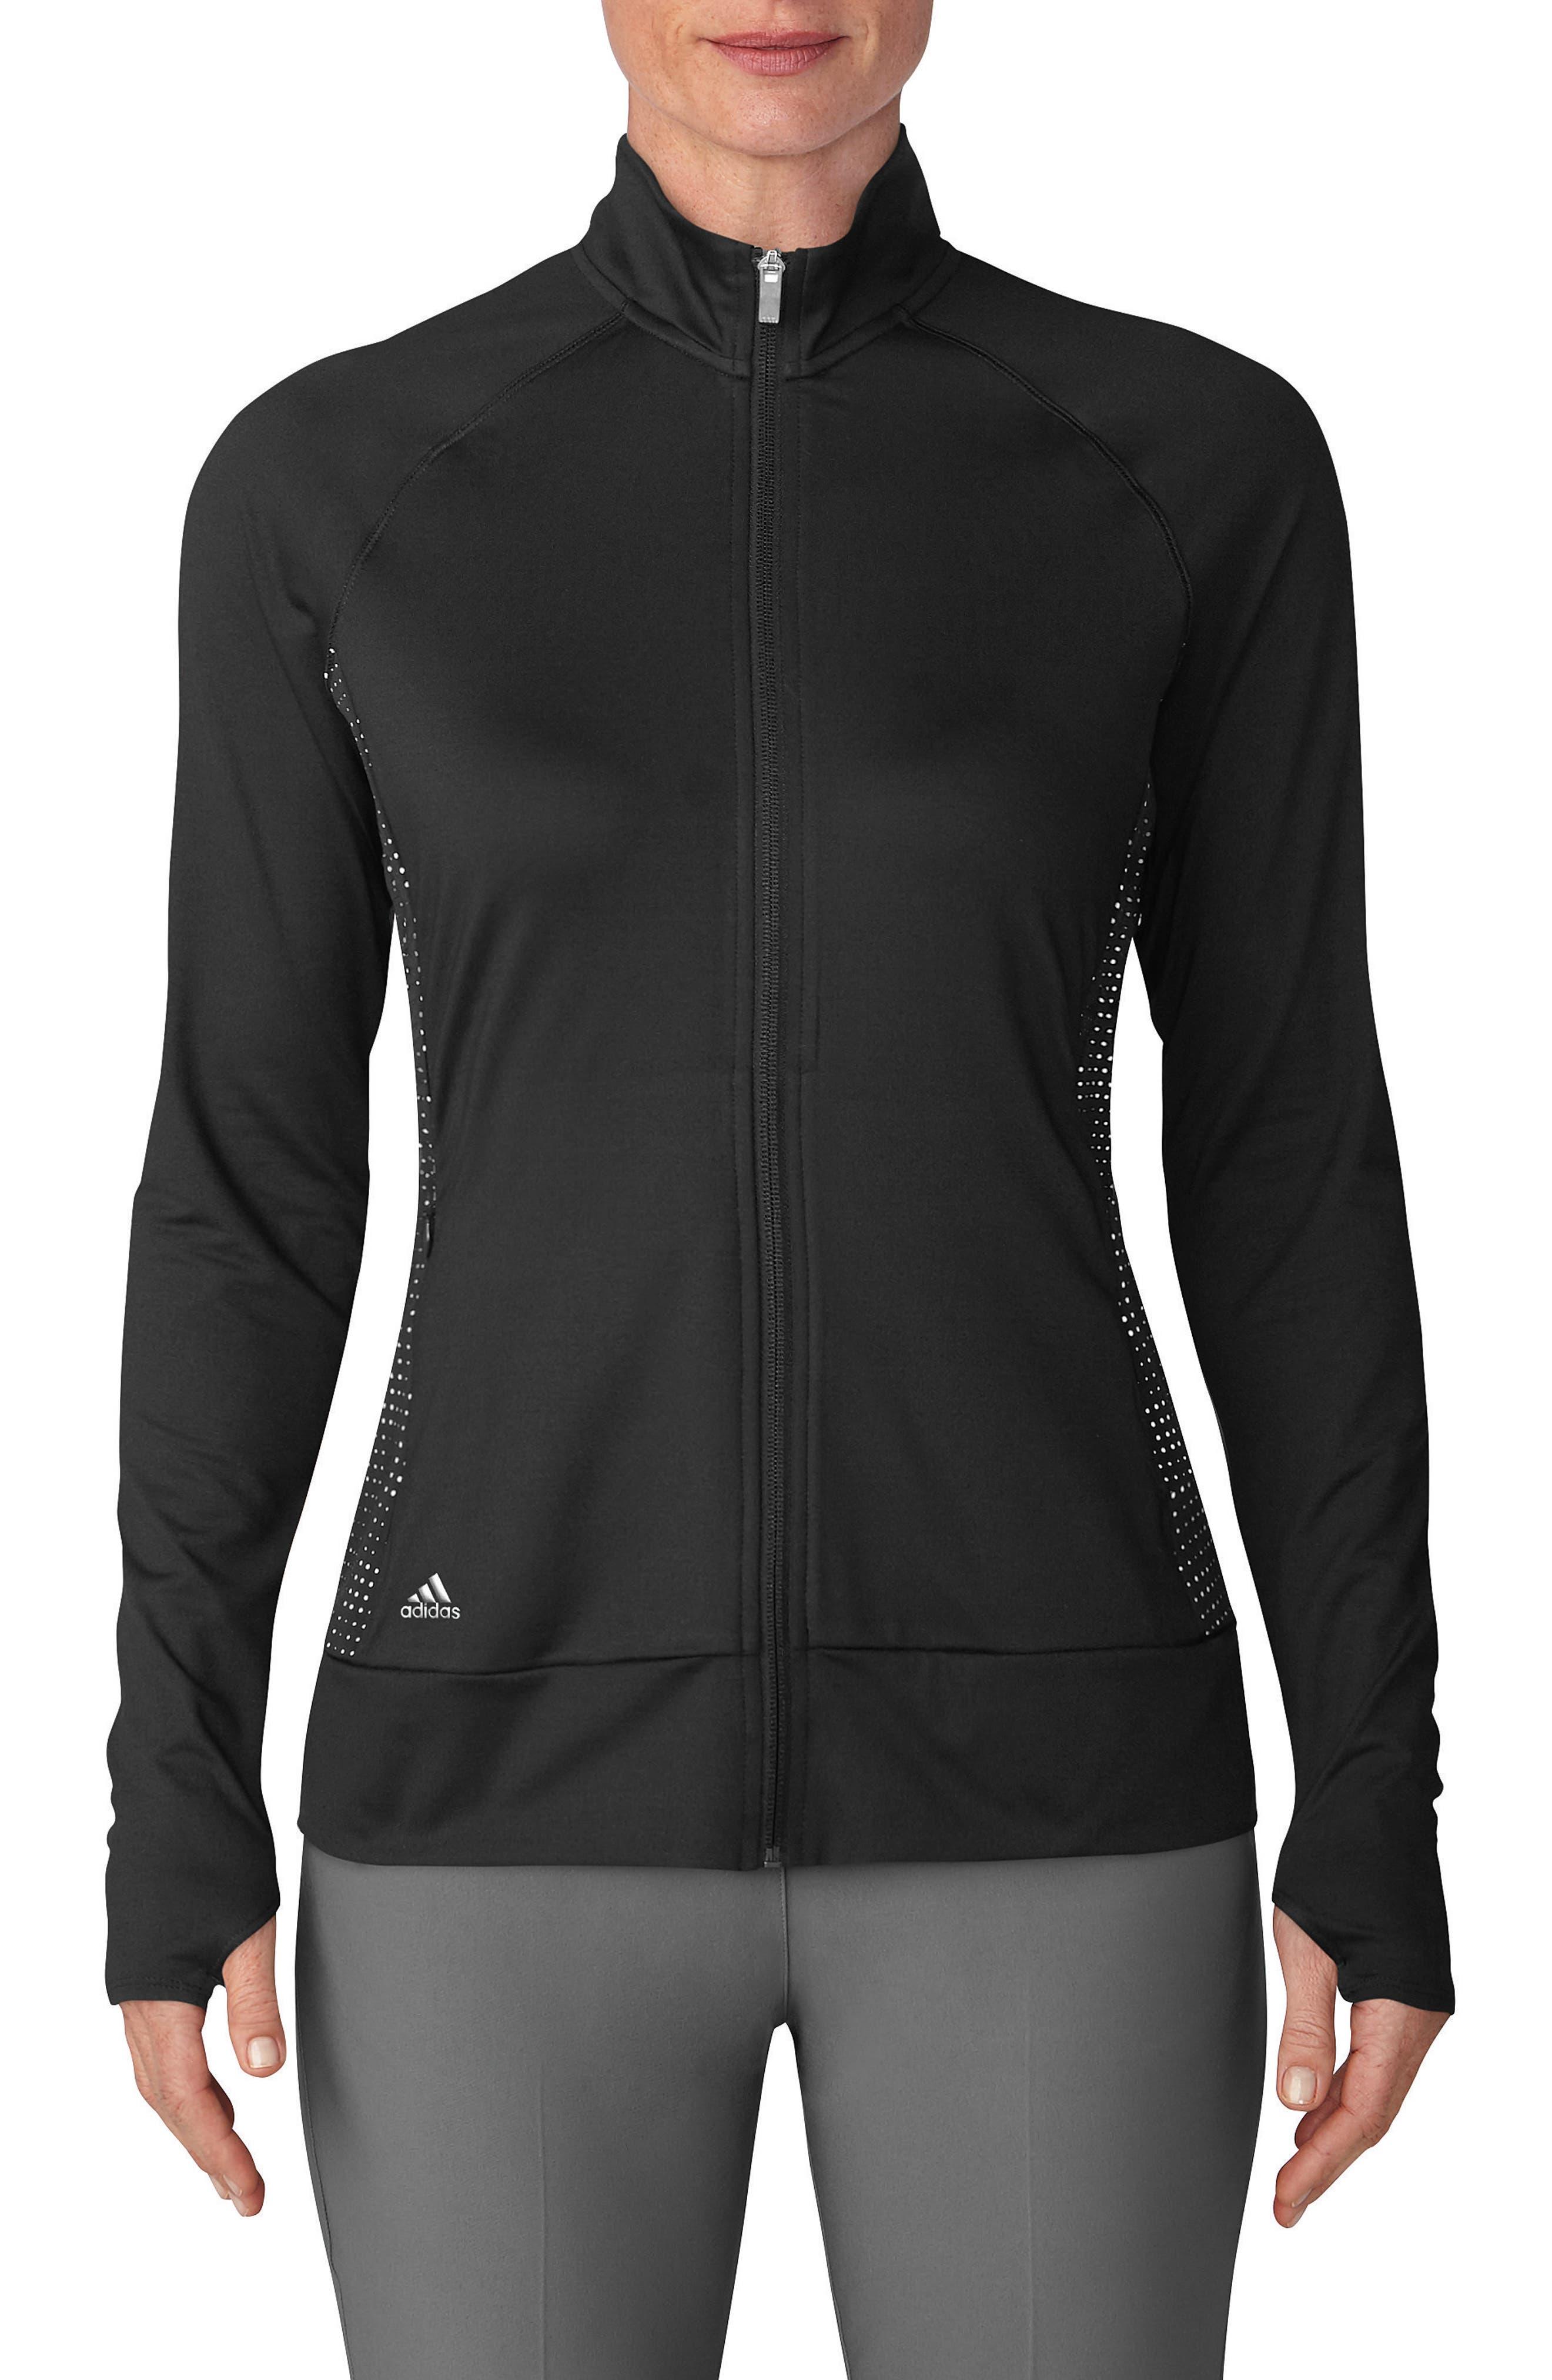 Range Wear Jacket,                             Main thumbnail 1, color,                             Black